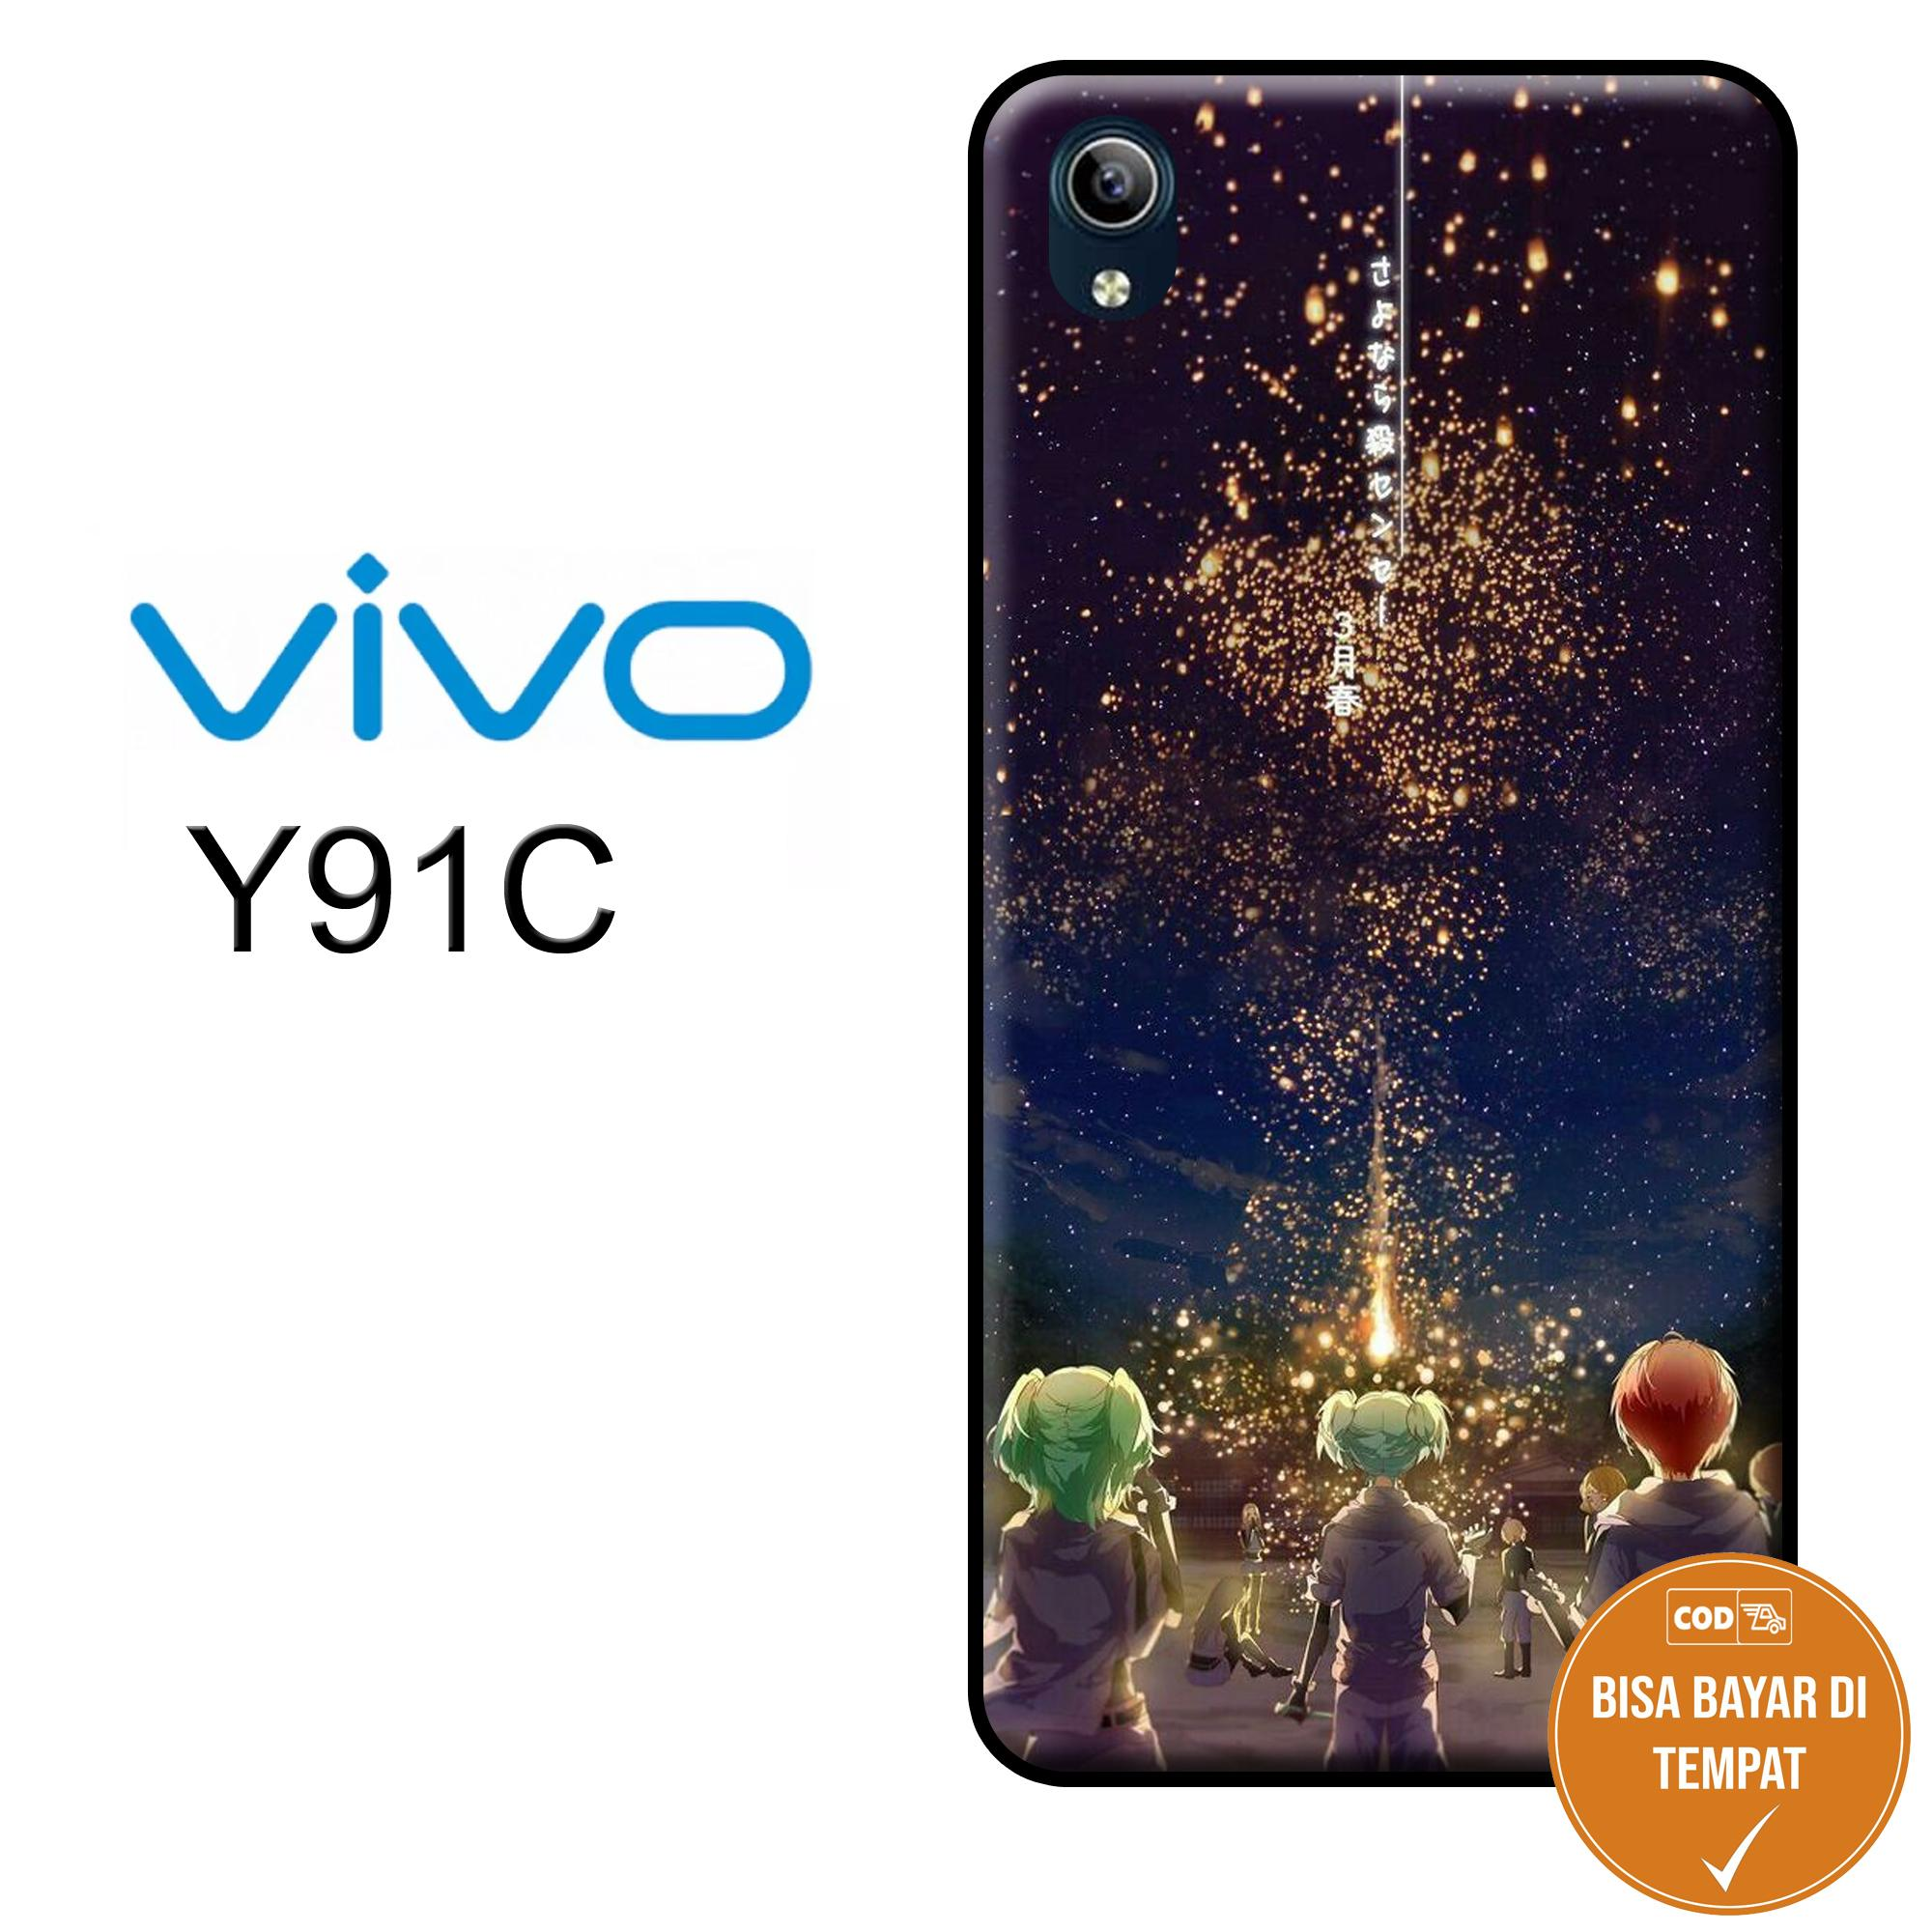 Case Vivo Y91C Anime 1 05 - Marinstore Pelindung Hp, Case Hp, Casing Handphone - BIsa COD/ Bayar DItempat paling murah paling bagus